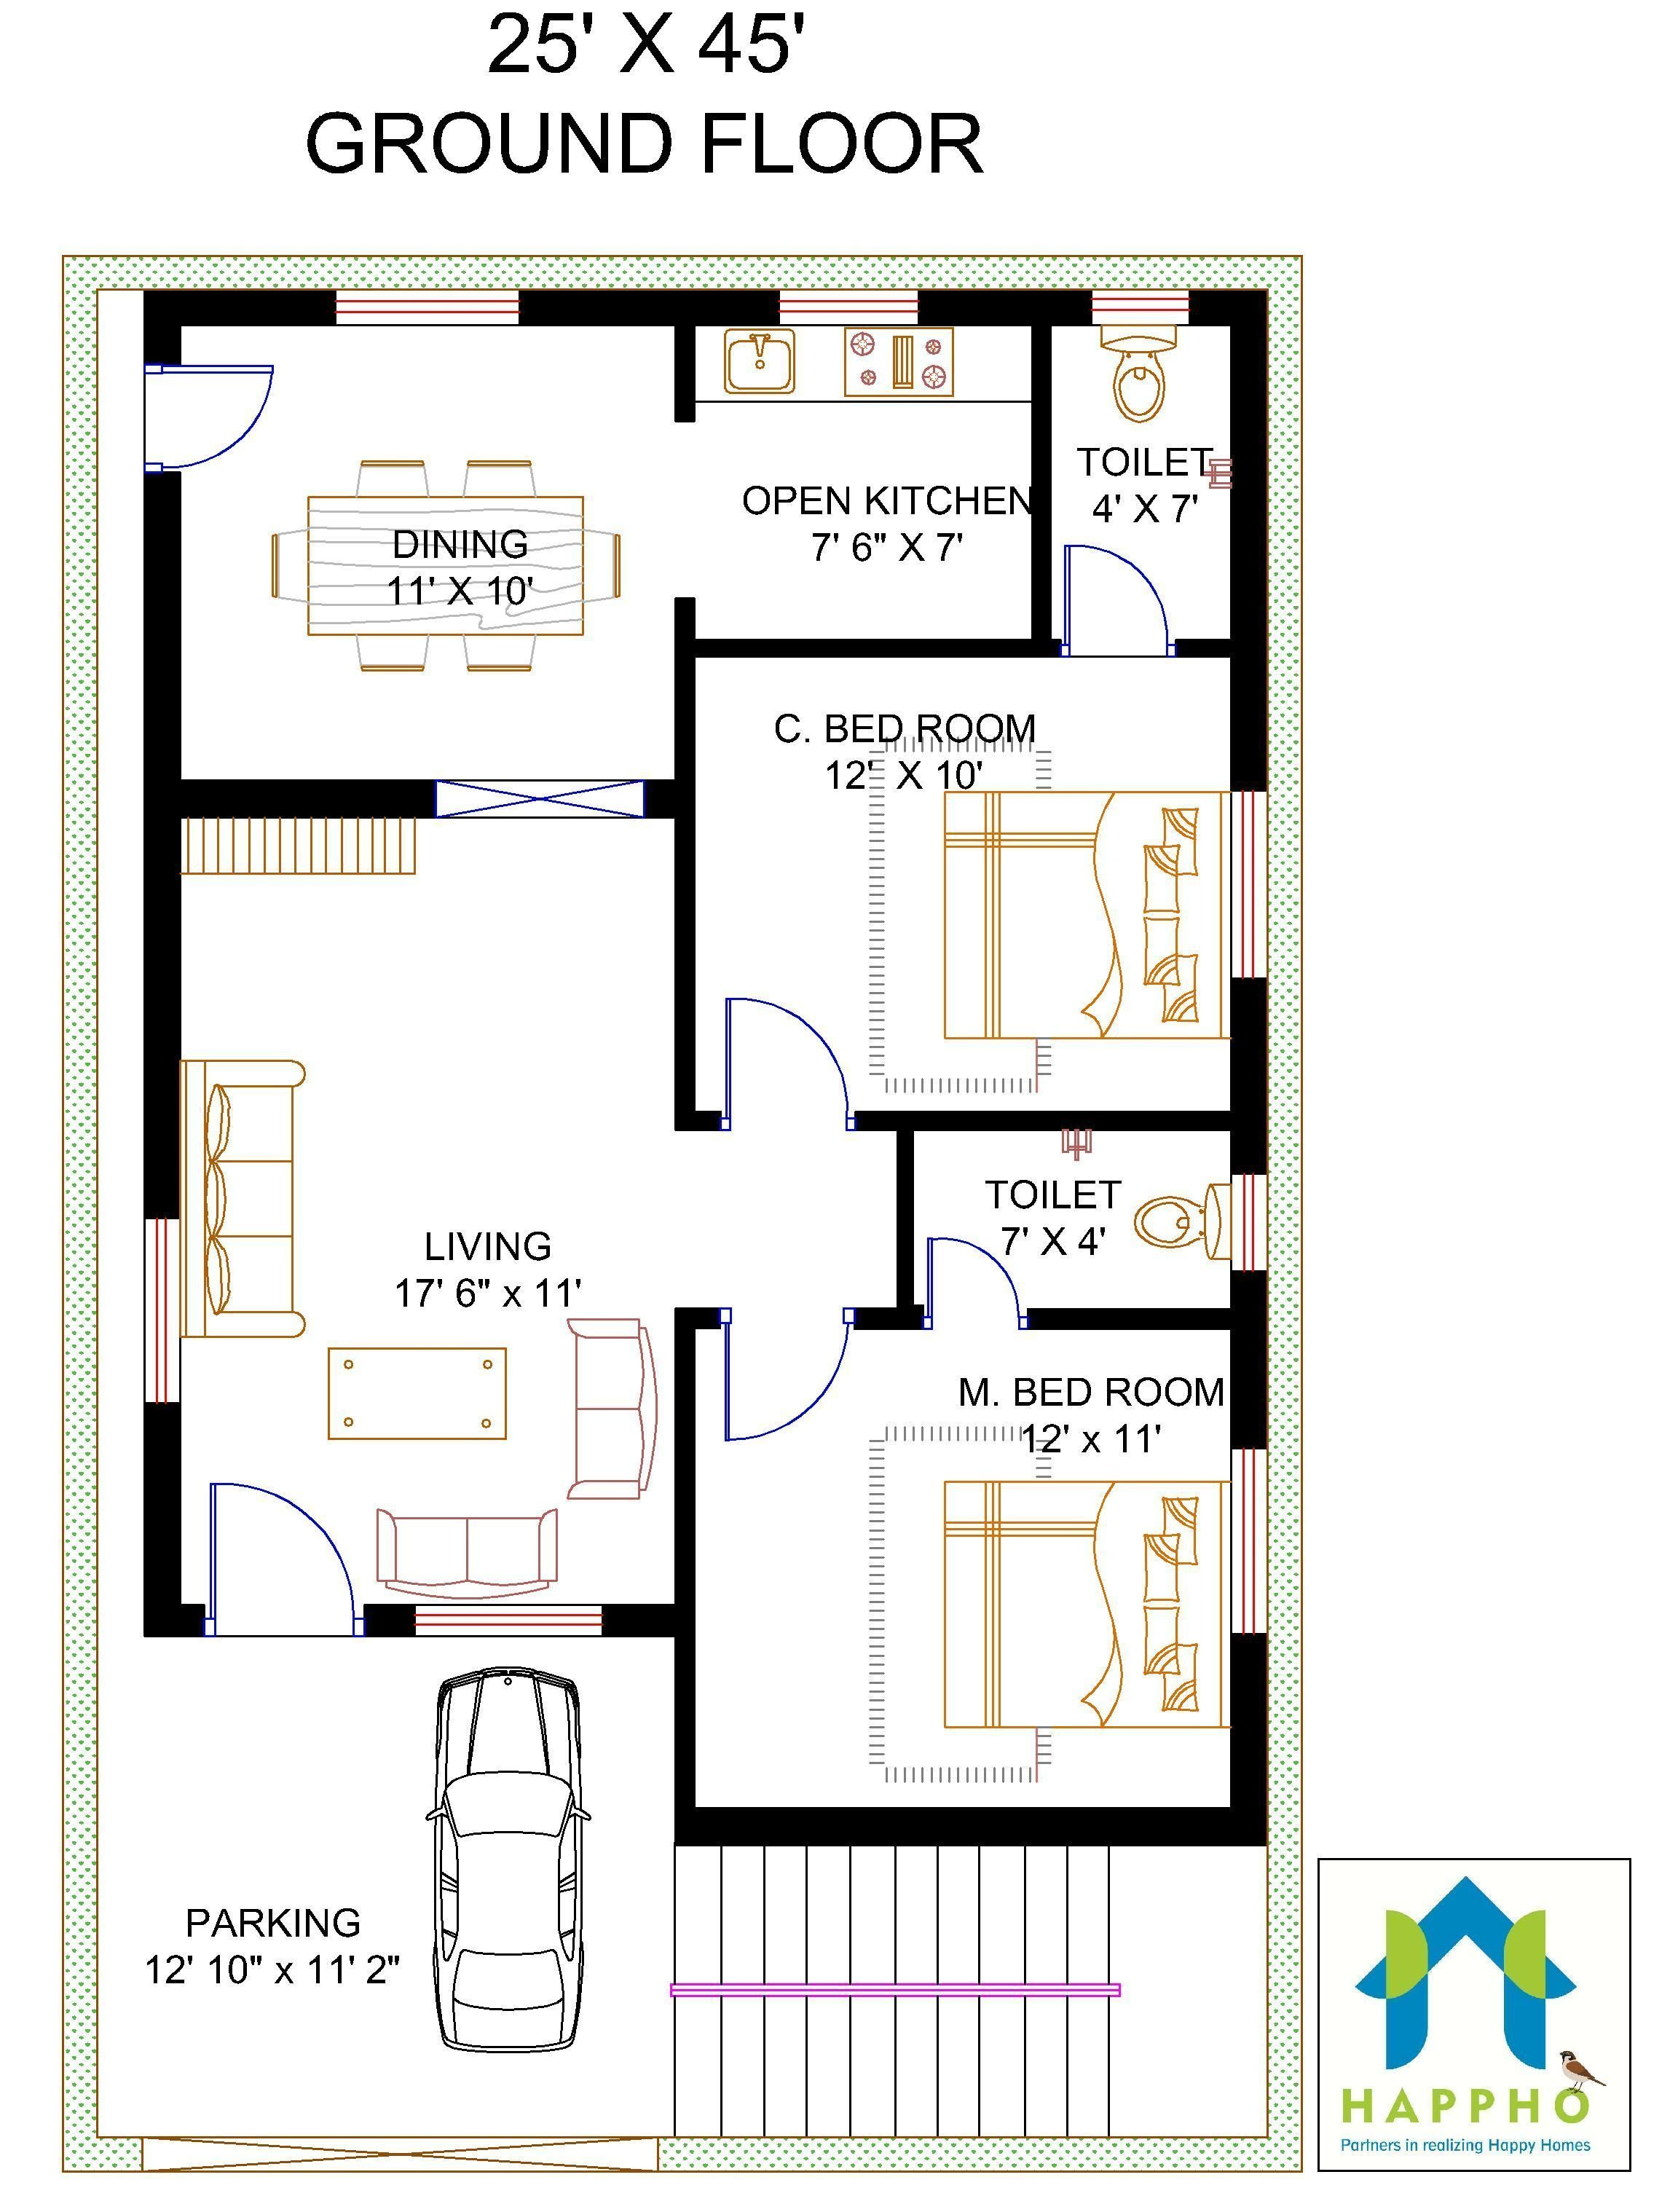 Decor With Cricut Naksha 2545 Duplex House Plans In 2020 20x40 House Plans Indian House Plans Bedroom House Plans